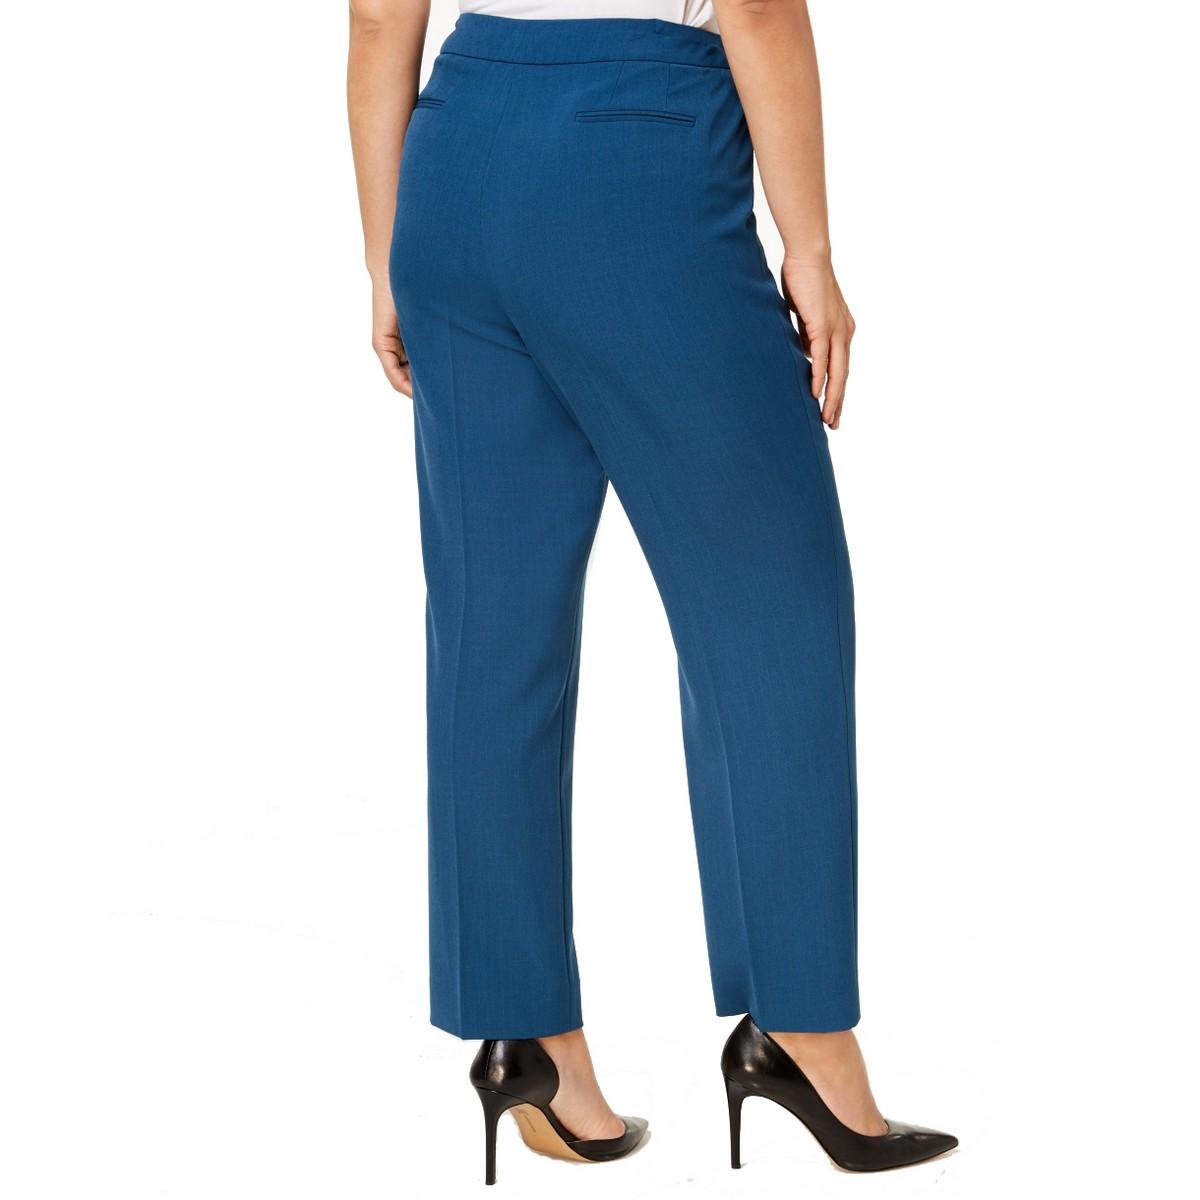 ANNE-KLEIN-NEW-Women-039-s-Plus-Size-Extended-tab-Dress-Pants-TEDO thumbnail 4